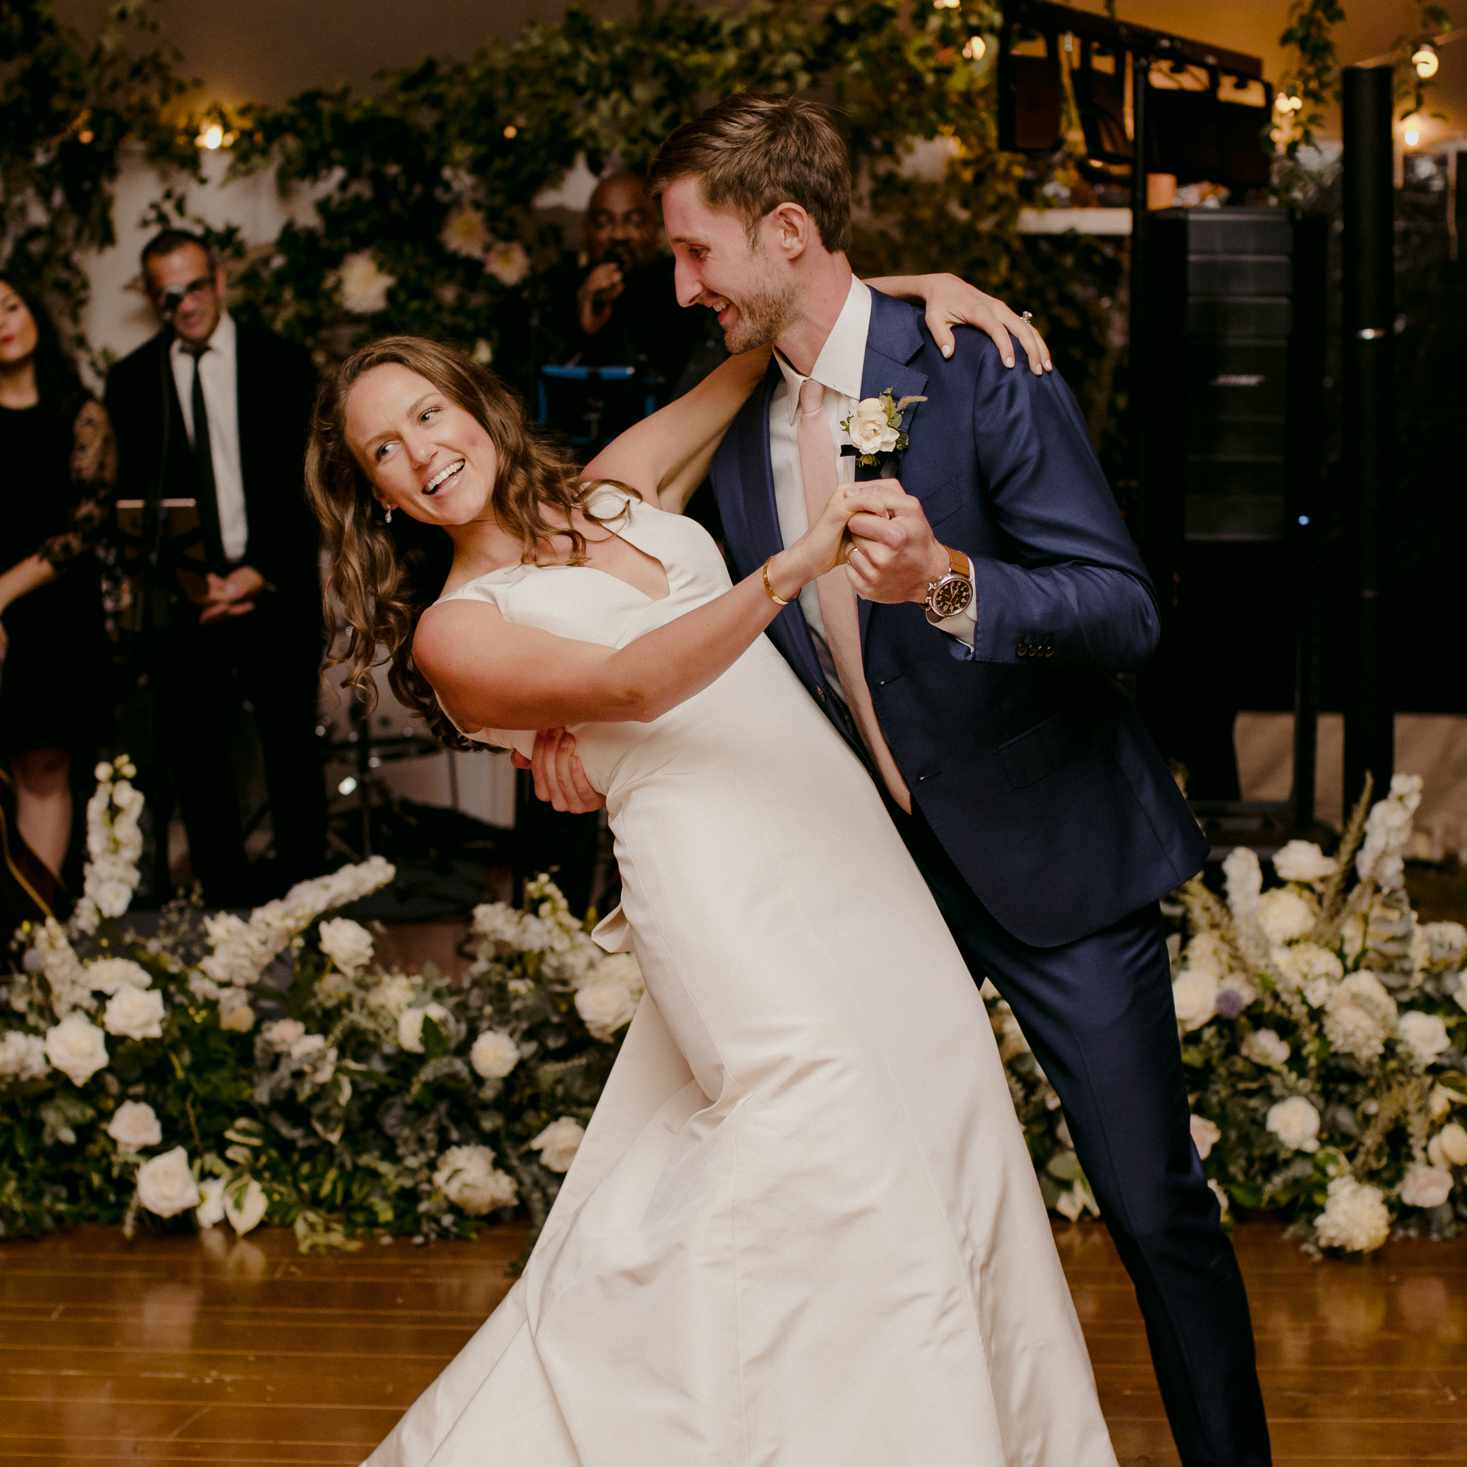 at-home rustic massachusetts wedding, bride and groom dancing